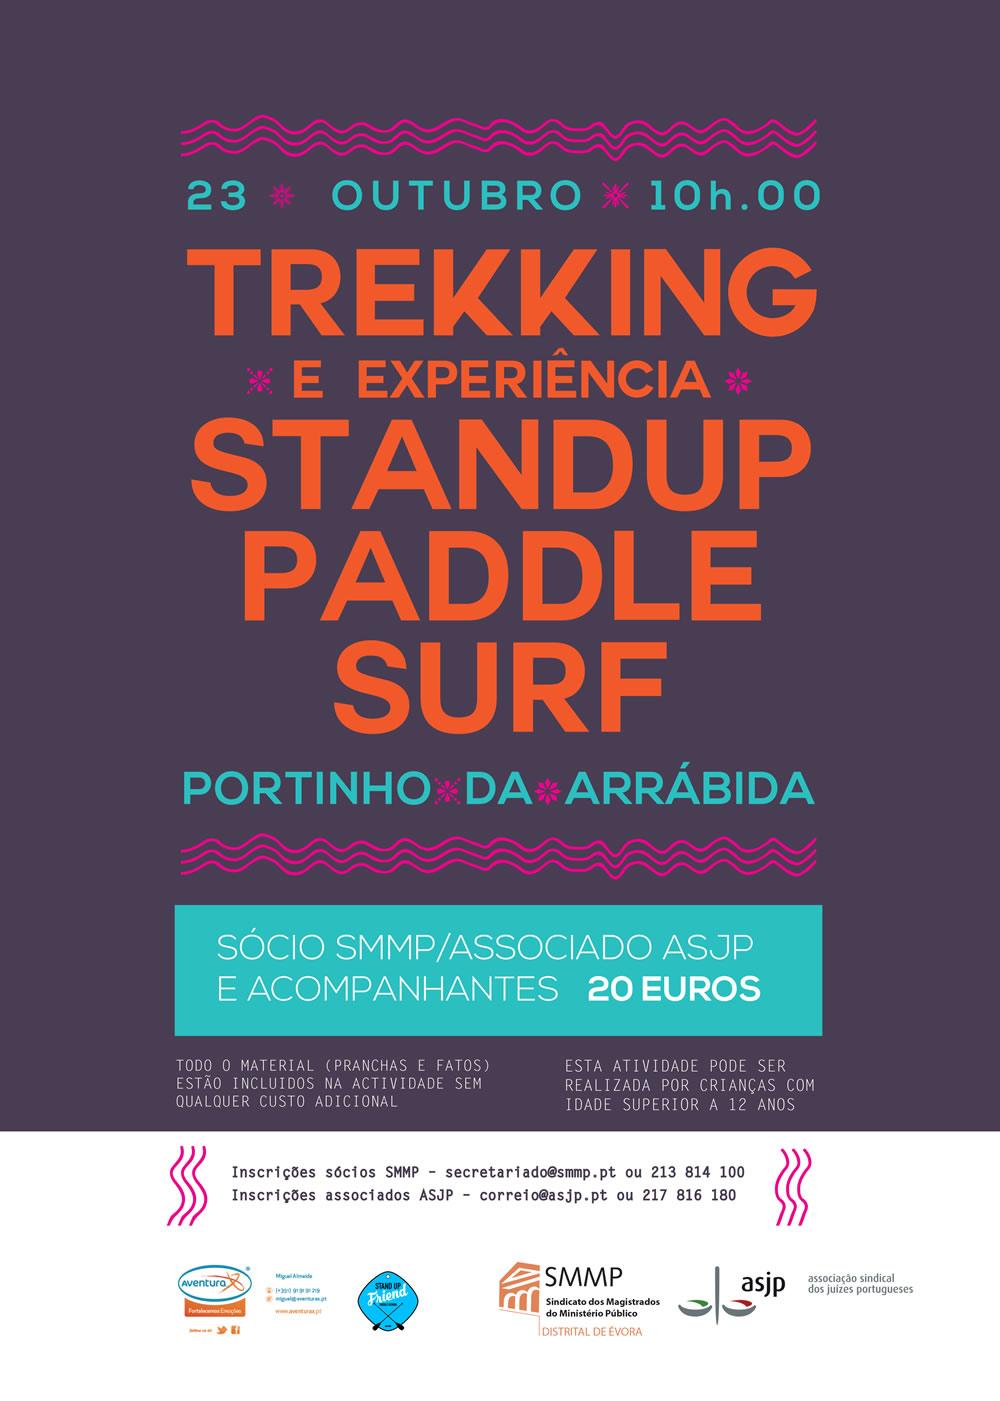 Trekking e Experiência StandUp Paddle Surf